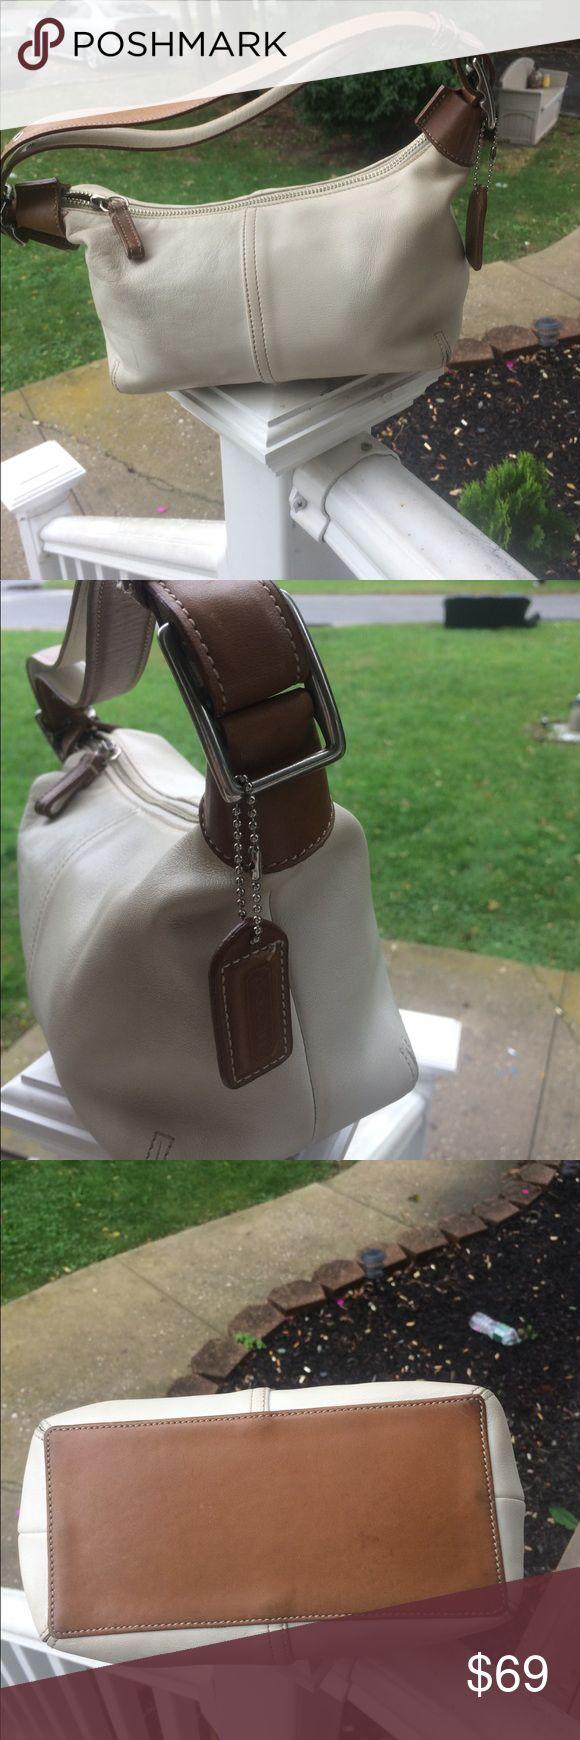 Coach hobo handbag   Pre owned condition authentic coach hobo bag  Coach Bags Hobos